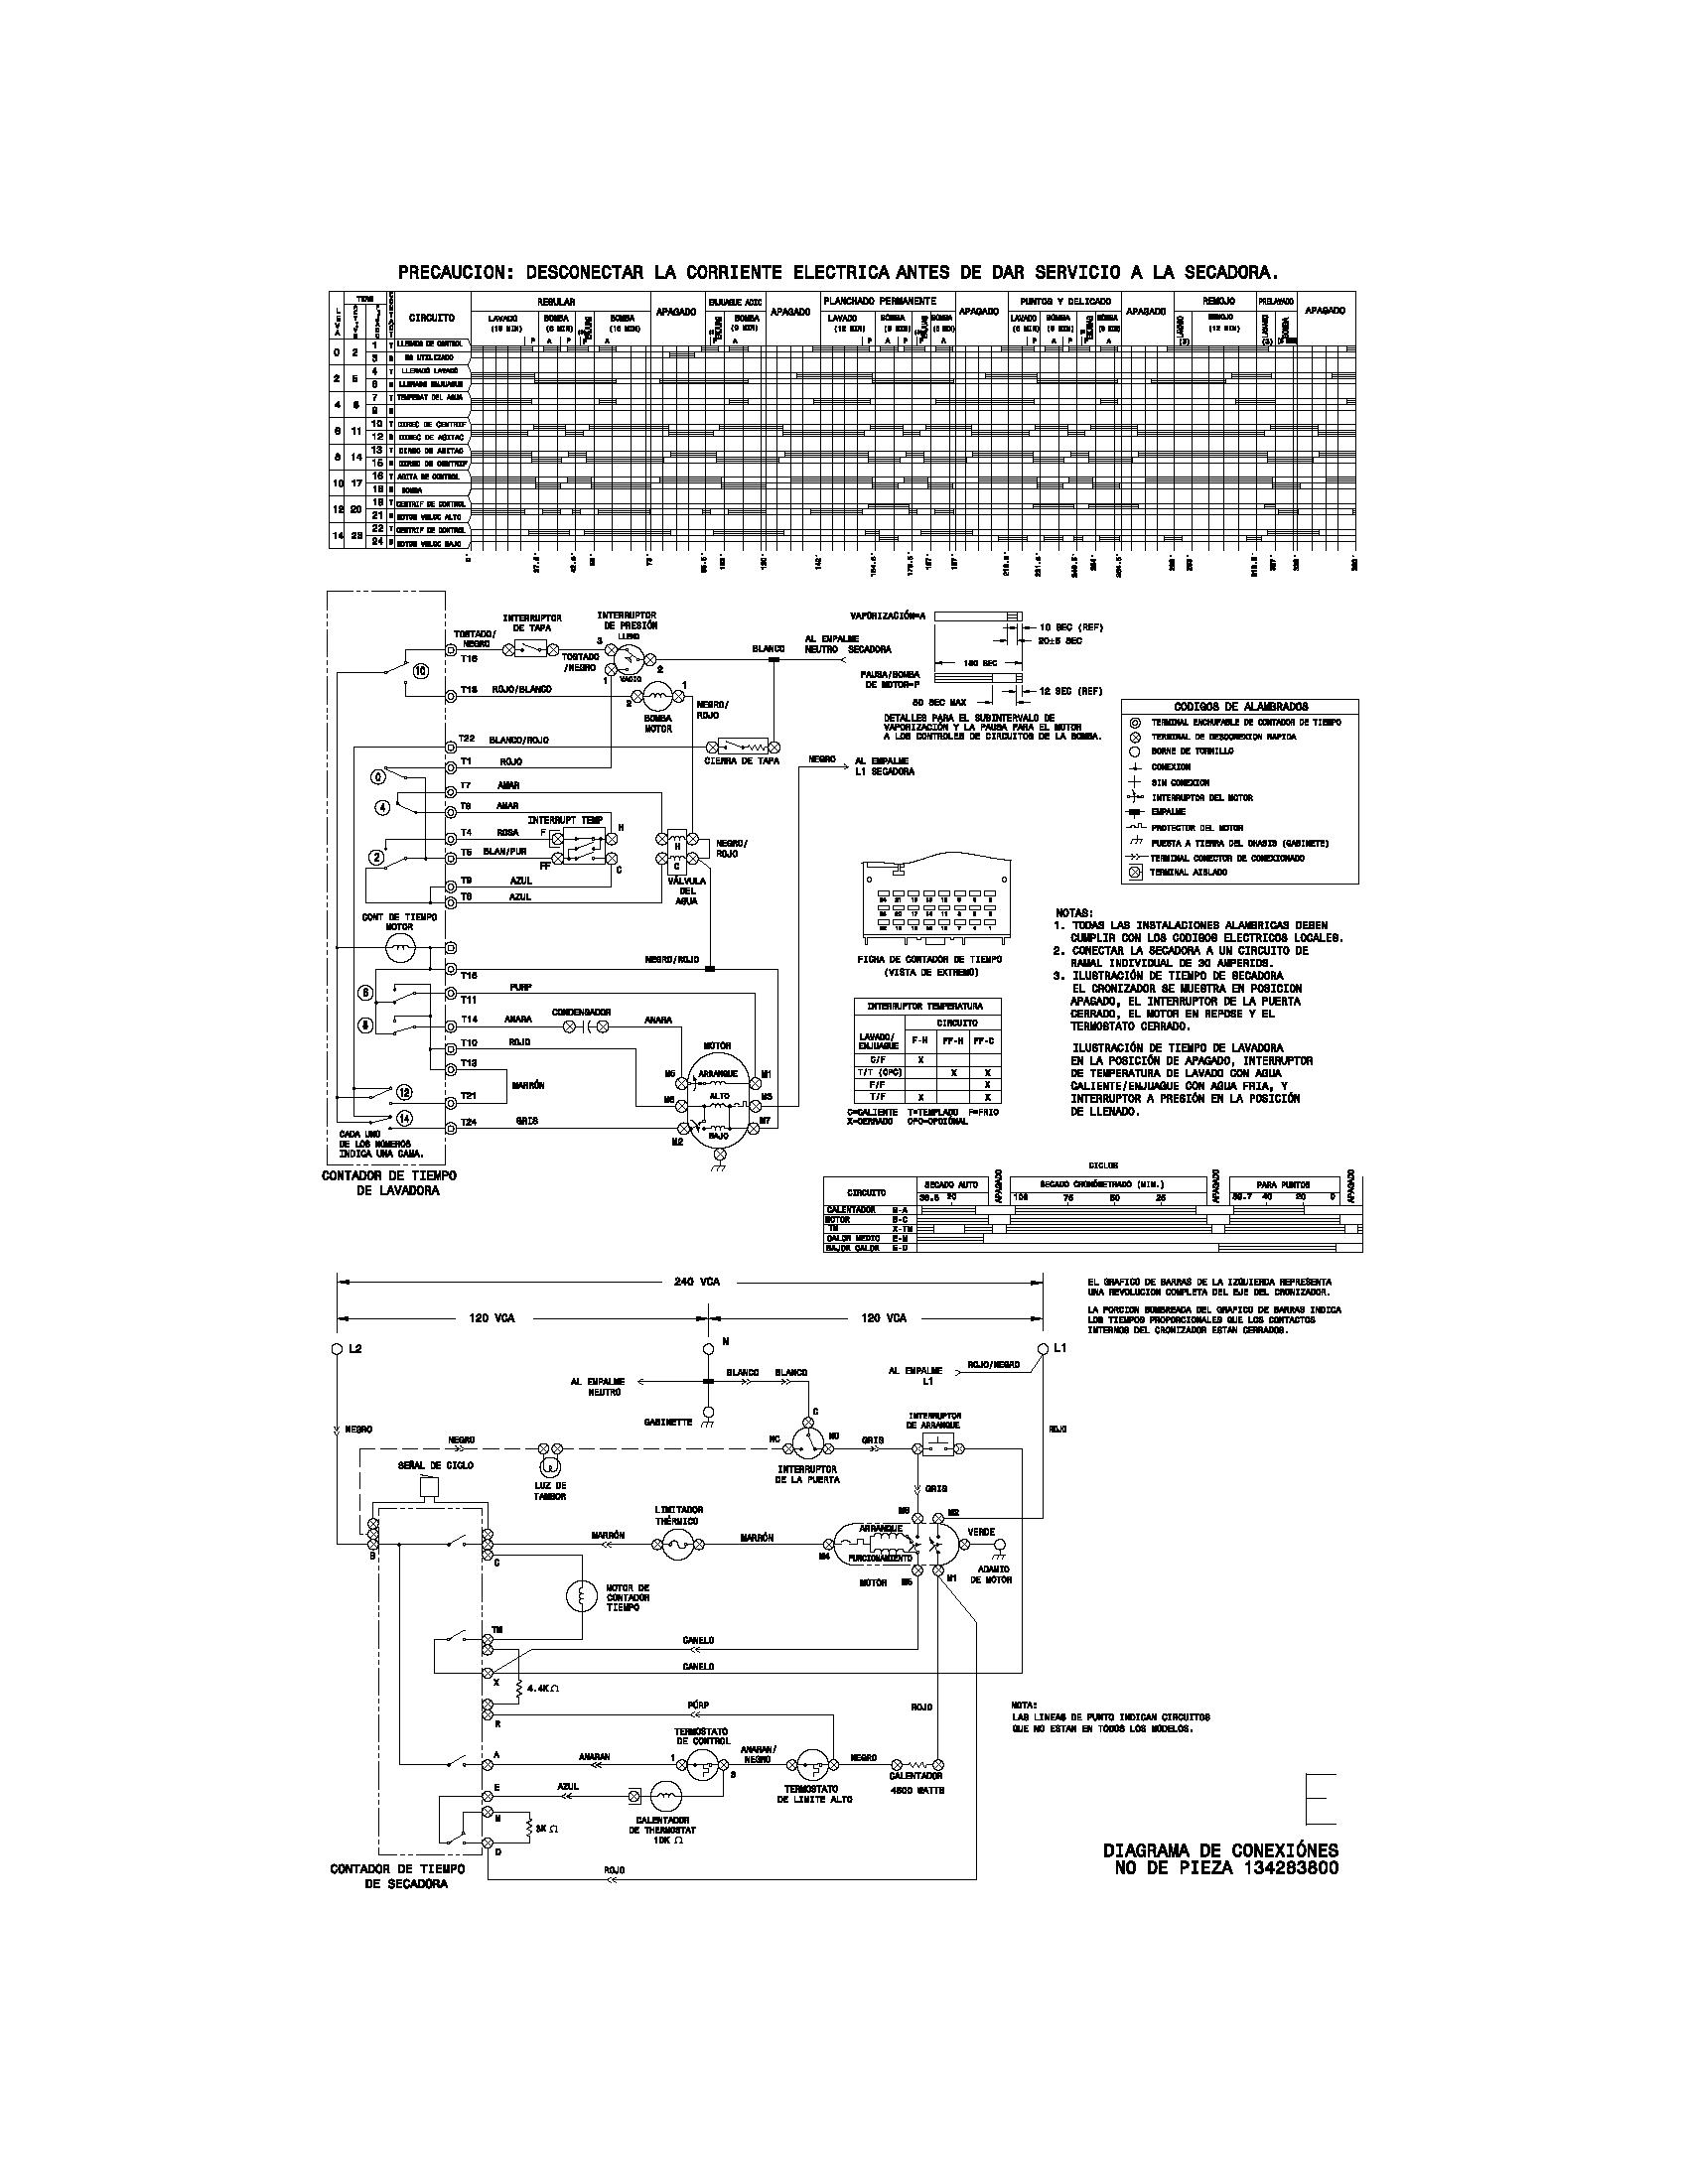 kenmore wiring diagram 2004 jeep tj laundry center diagrams washing